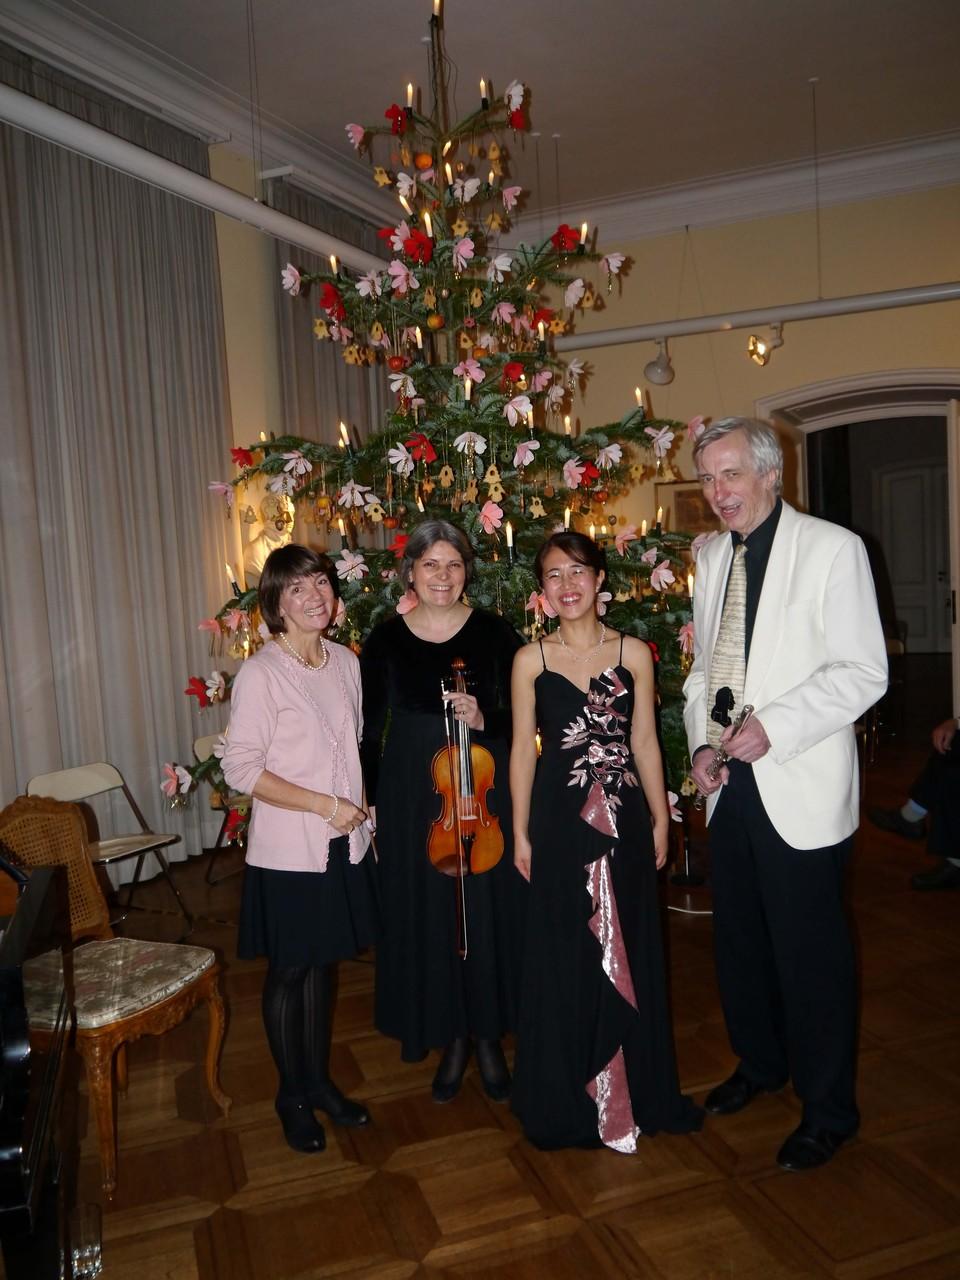 Weihnachtslesung im Goethe Museum 2015  クリスマスの朗読 ゲーテ美術館 2015